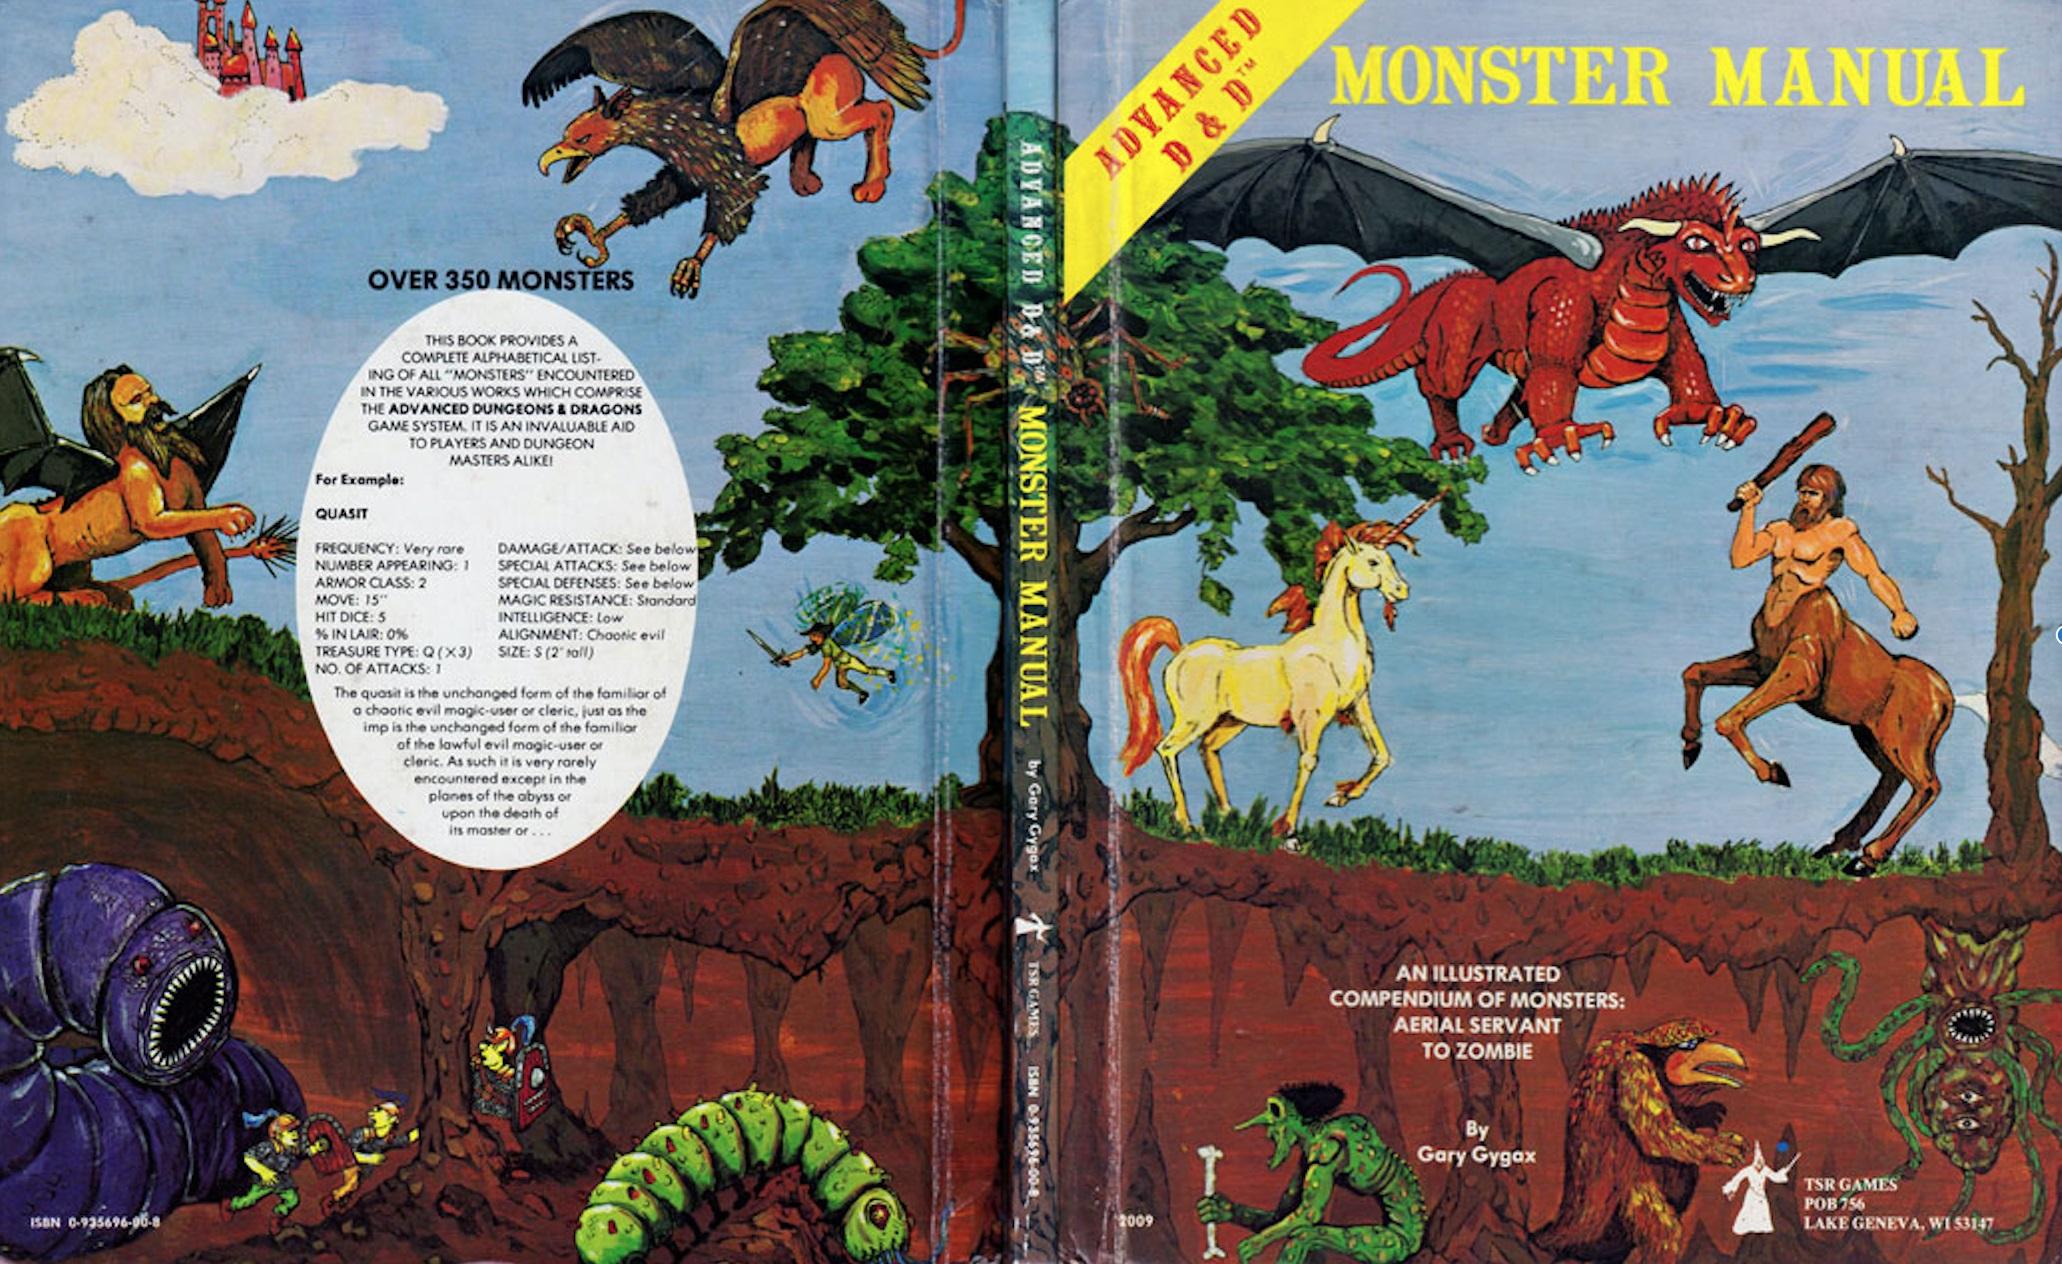 black gate articles the cold counsel of rpgs rh blackgate com Monster Manual Art T-Shirt Monster Manual Art